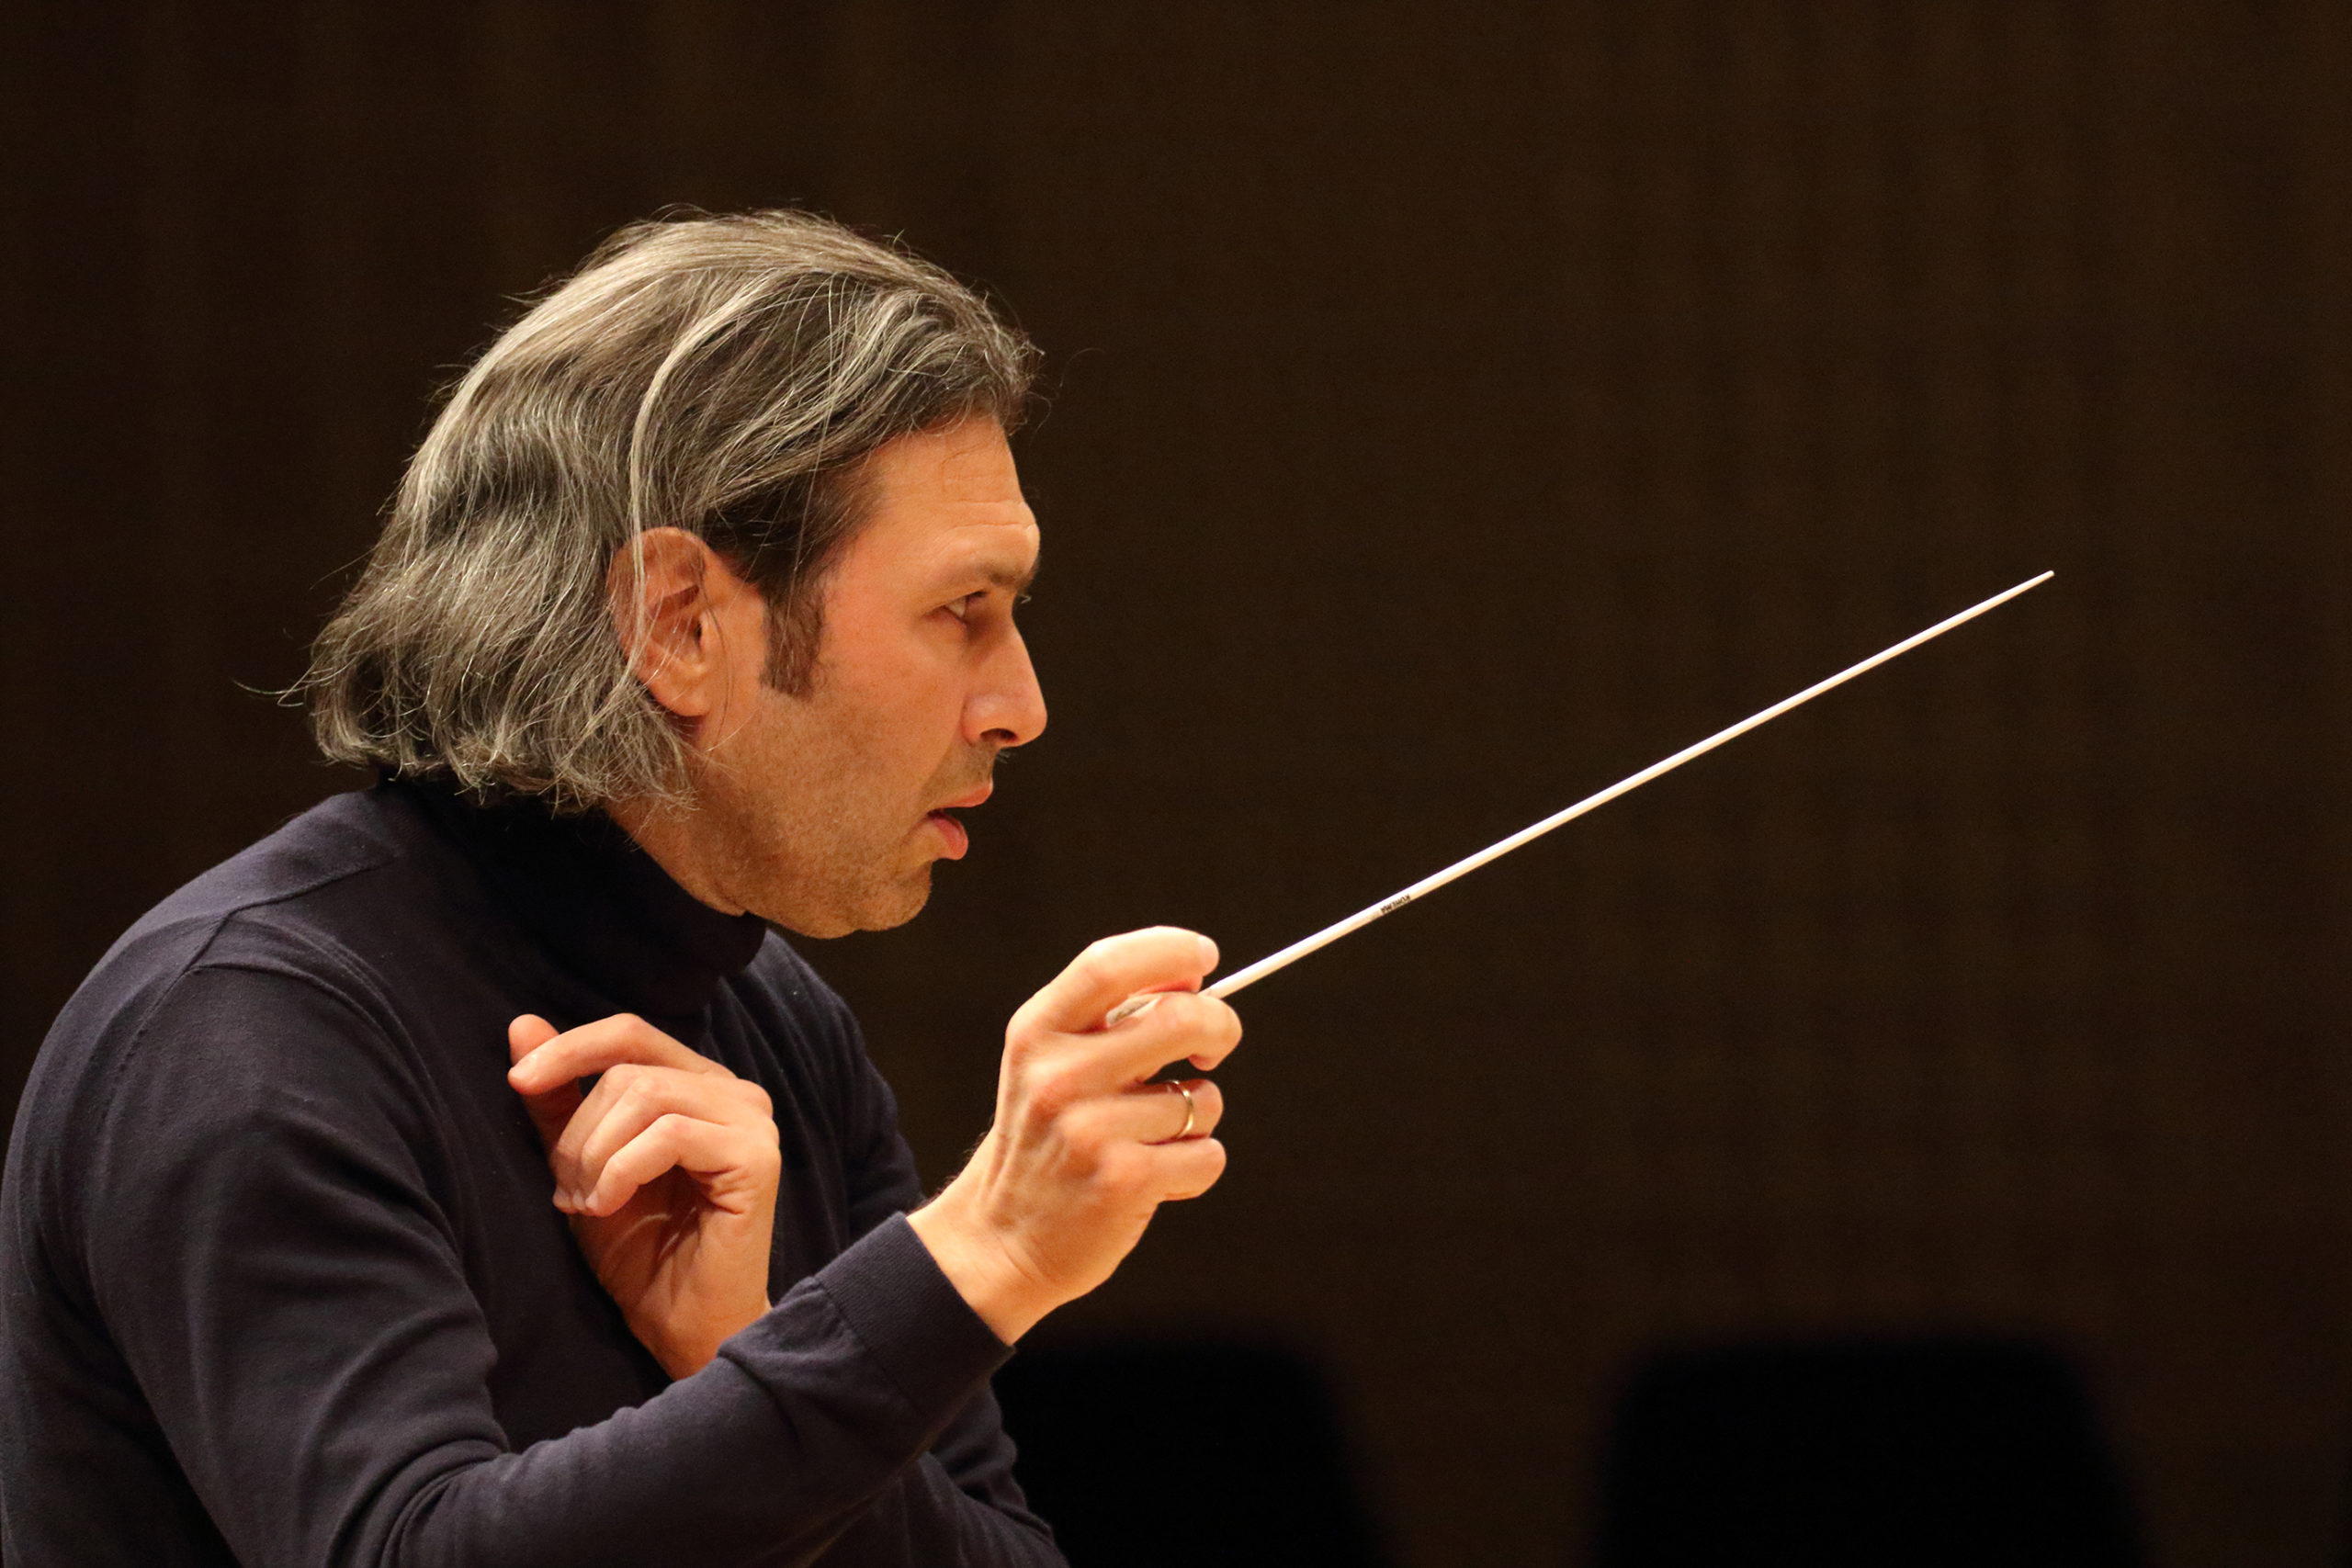 Vladimir Jurowski, conductor, Jurowski, Russian, maestro, Music Director, Bayerische Staatsoper, lead, music, classical, artist, musician